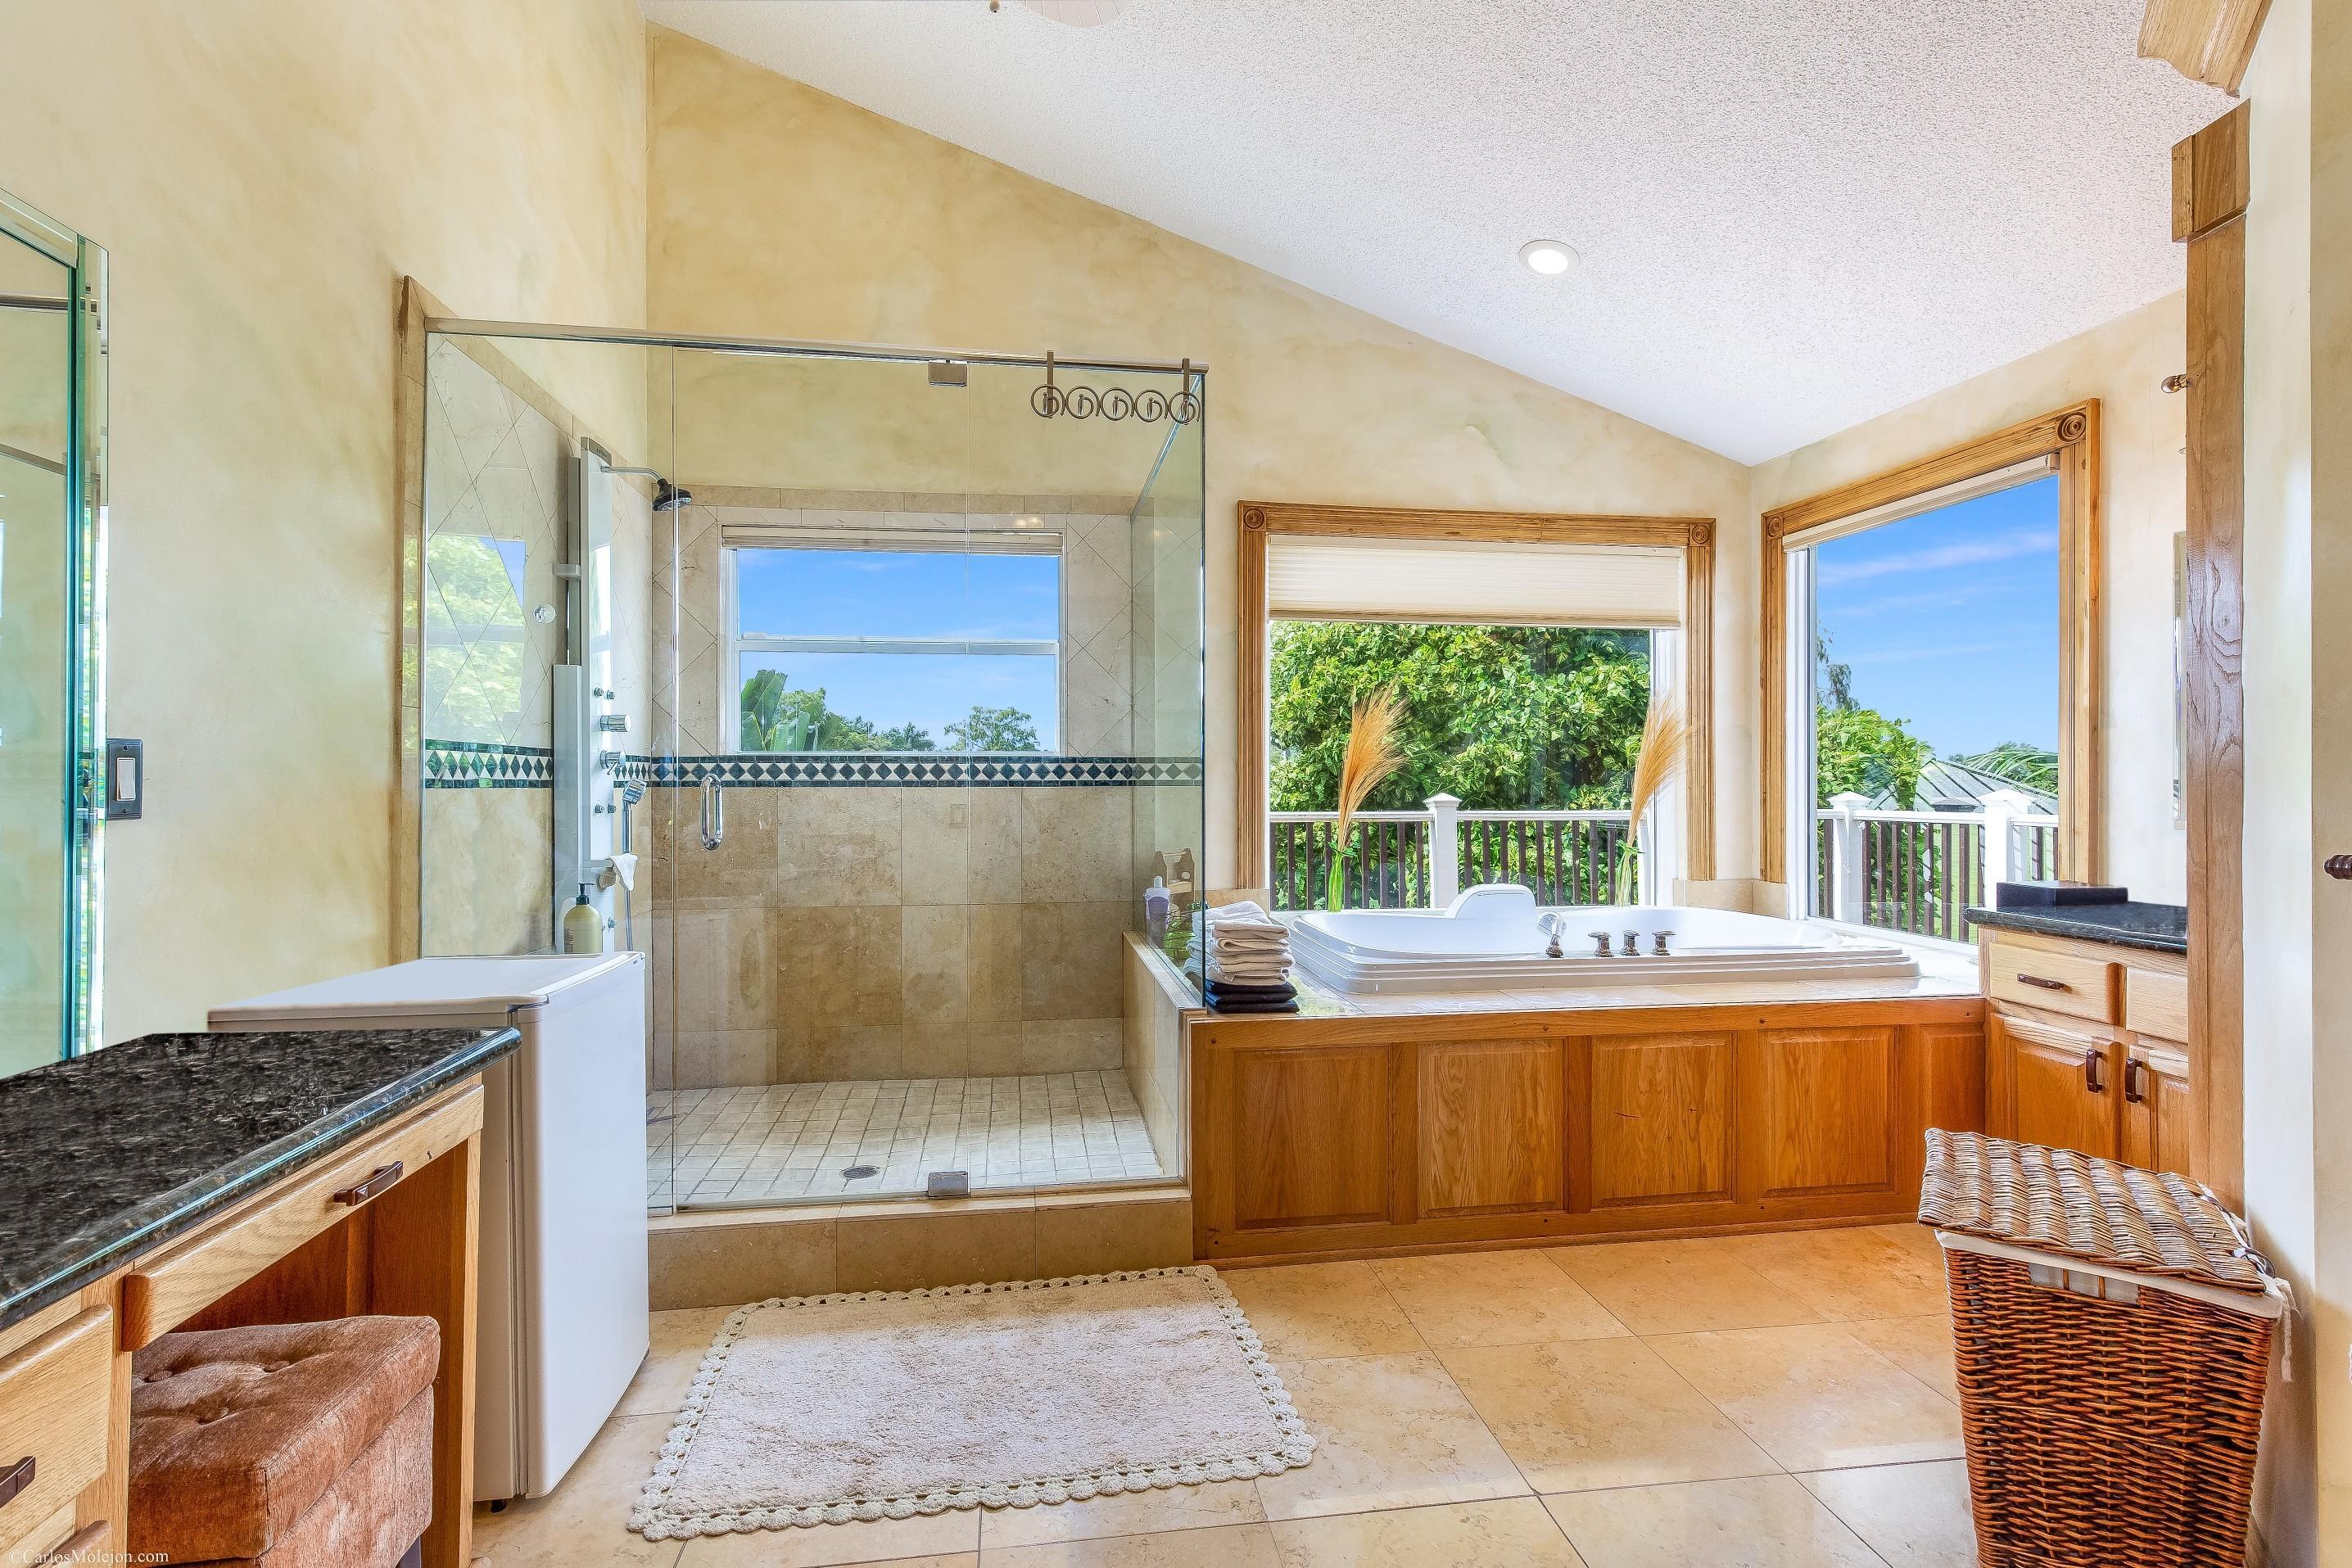 Master Bathroom - Shower & Jacuzzi